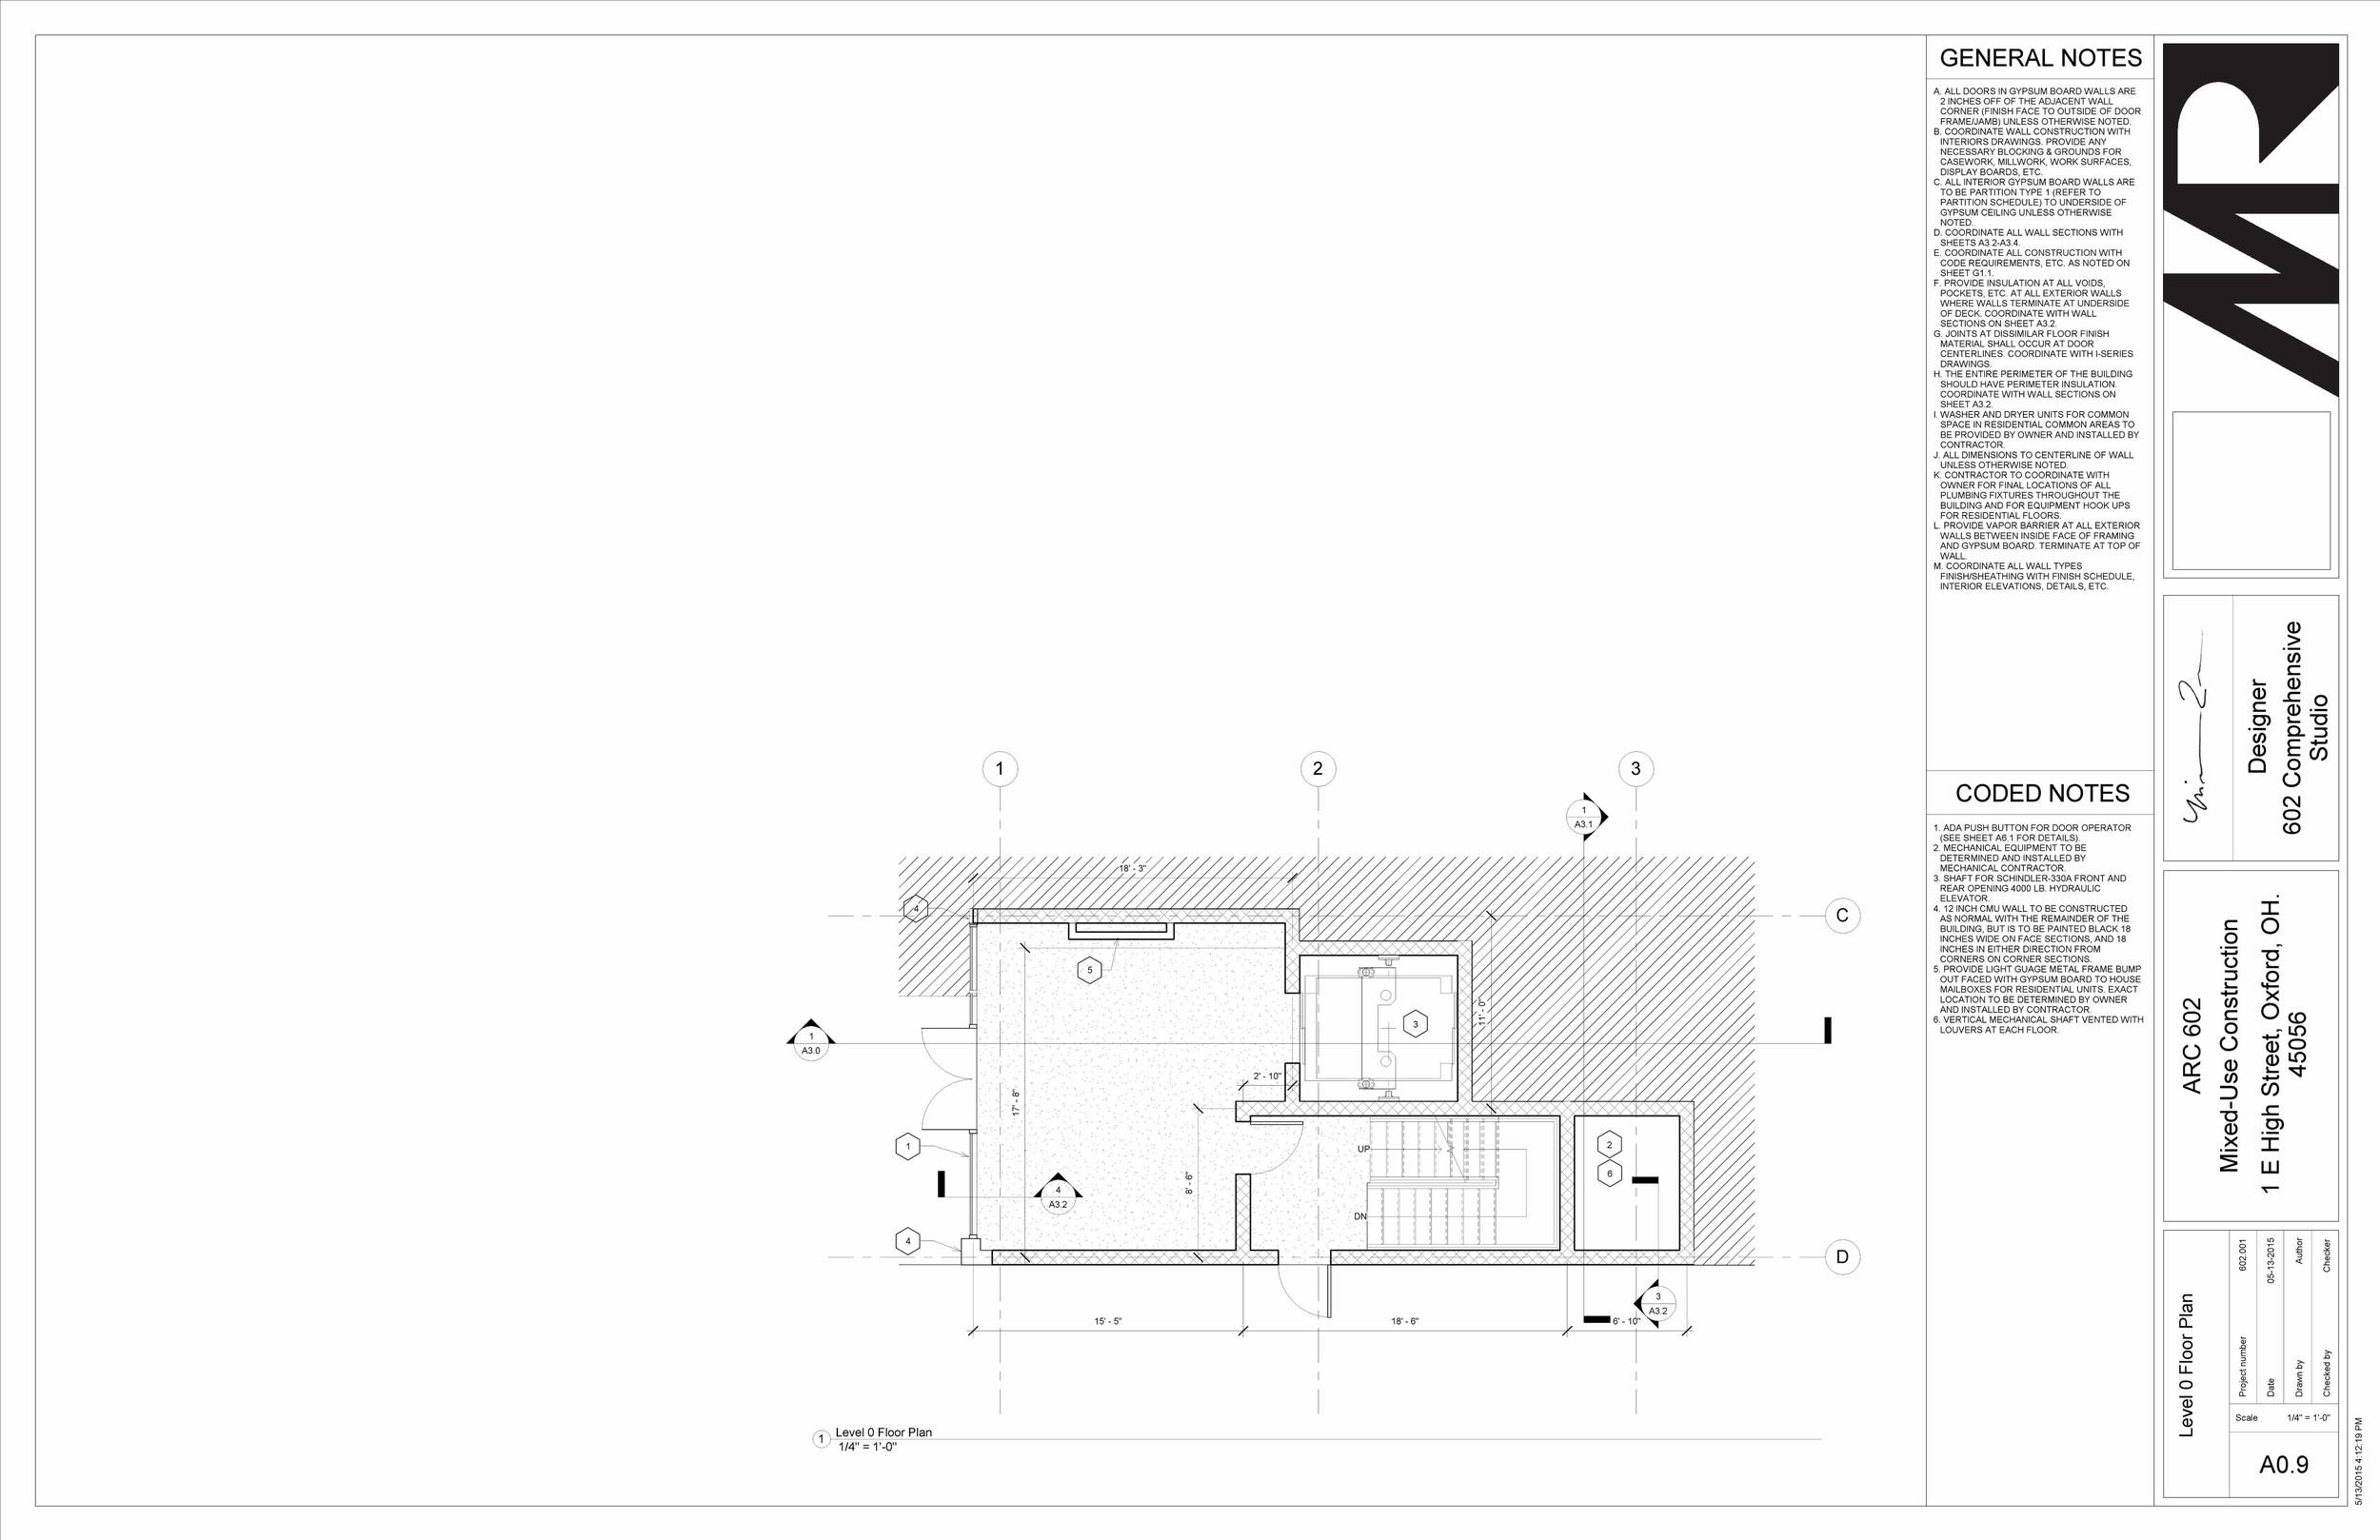 602 Studio - Sheet - A0-9 - Level 0 Floor Plan copy.jpg